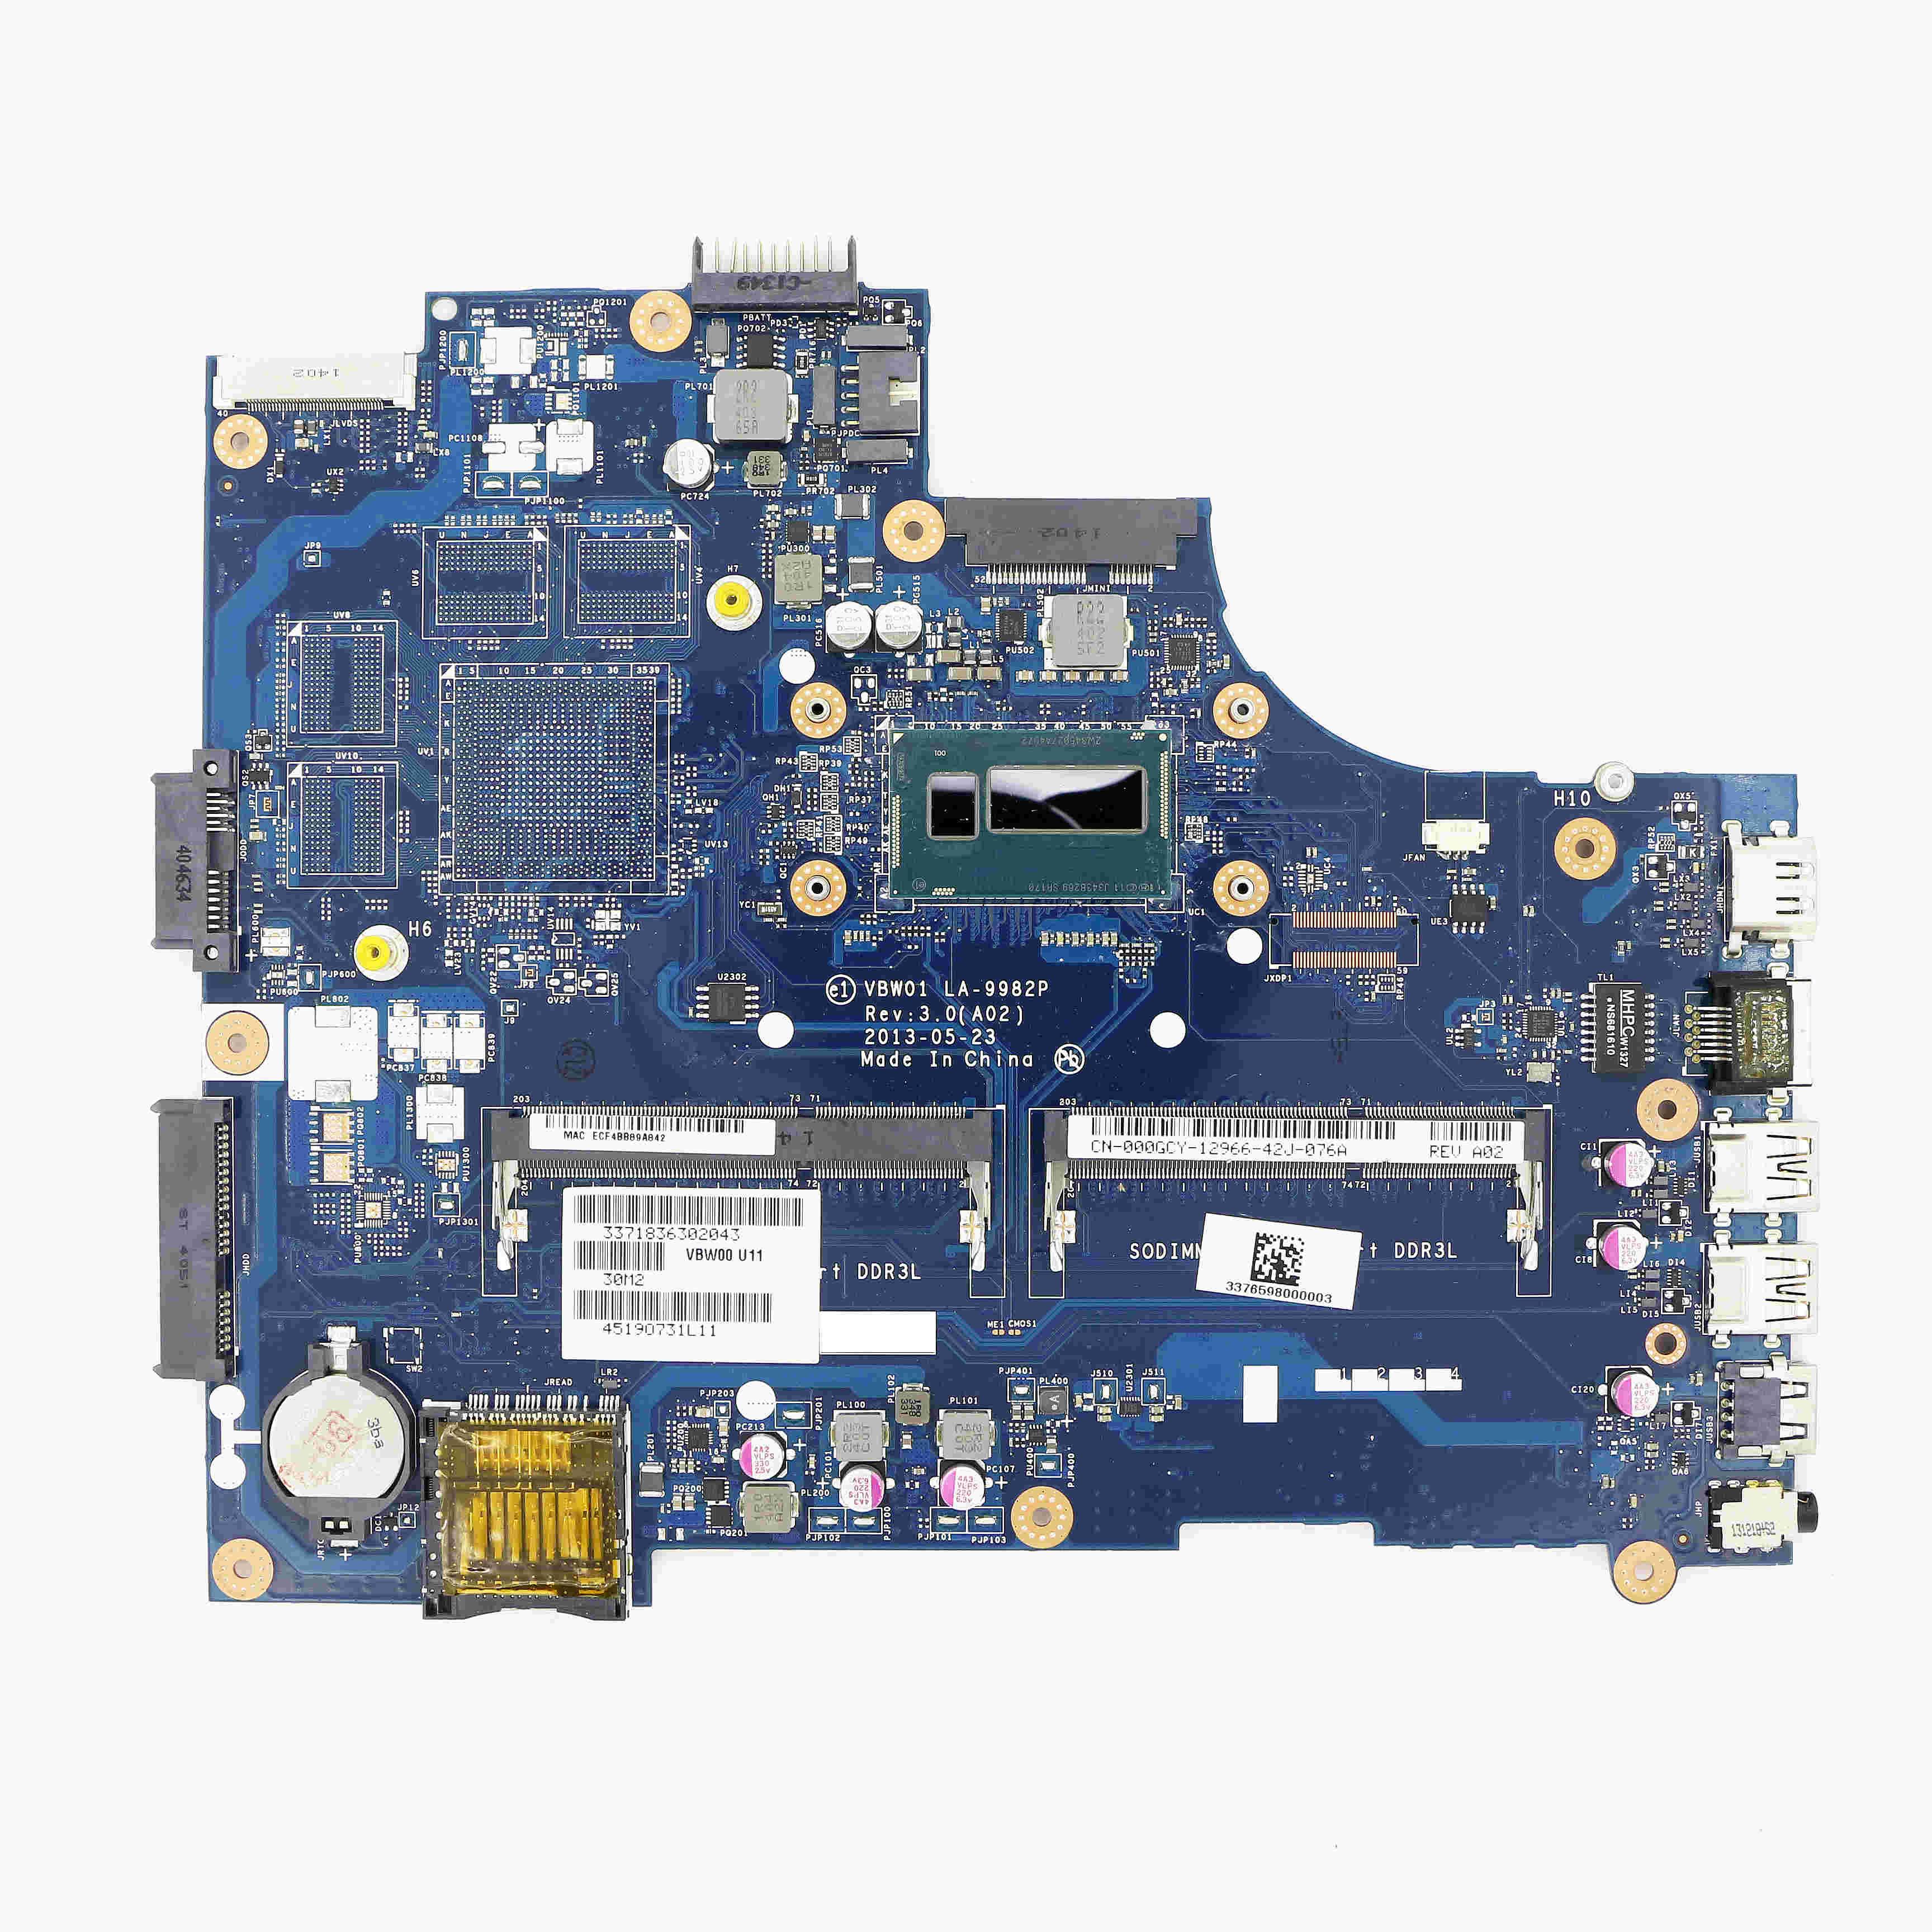 00GCY - UMA اللوحة VBW01 LA-9982P w/ i5-4200U 1.60GHz ل انسبايرون 15R (5537) / 15 (3537)